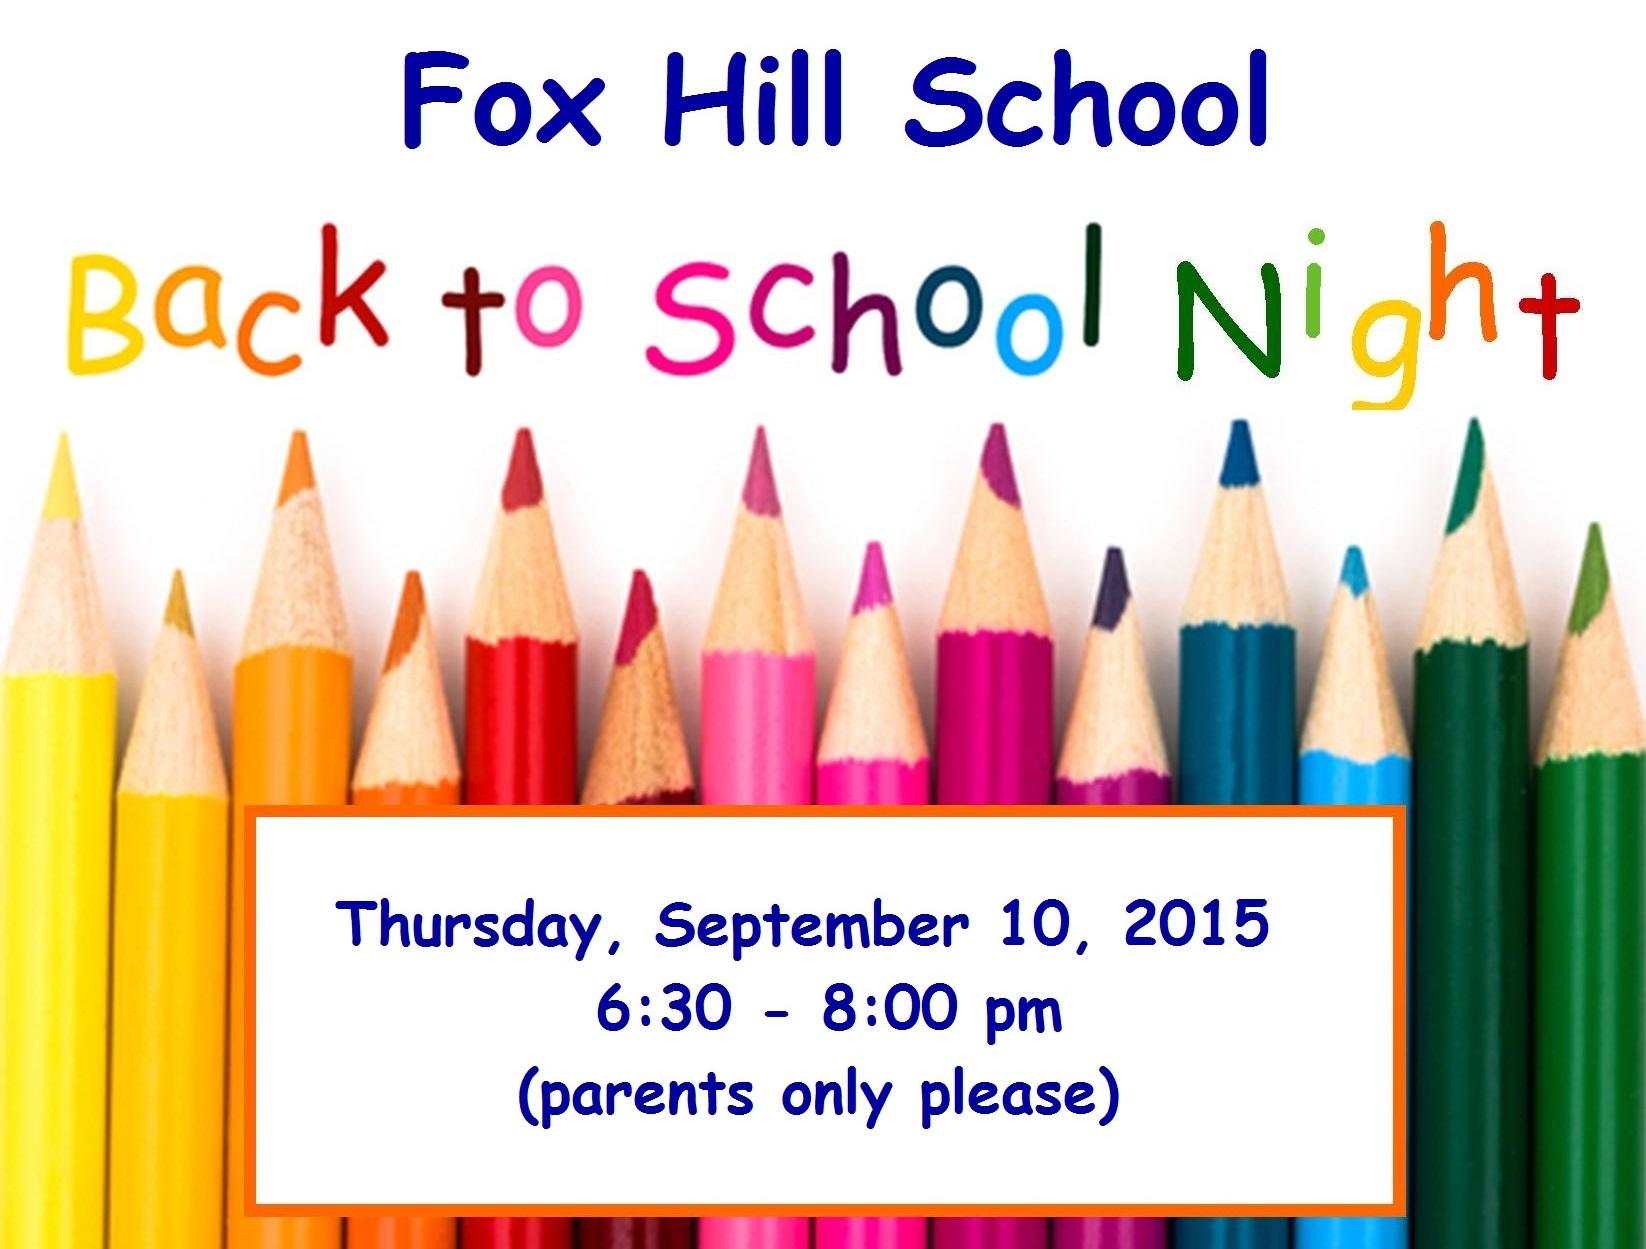 back-to-school-night-logo-2015-161.jpg (1646×1249)